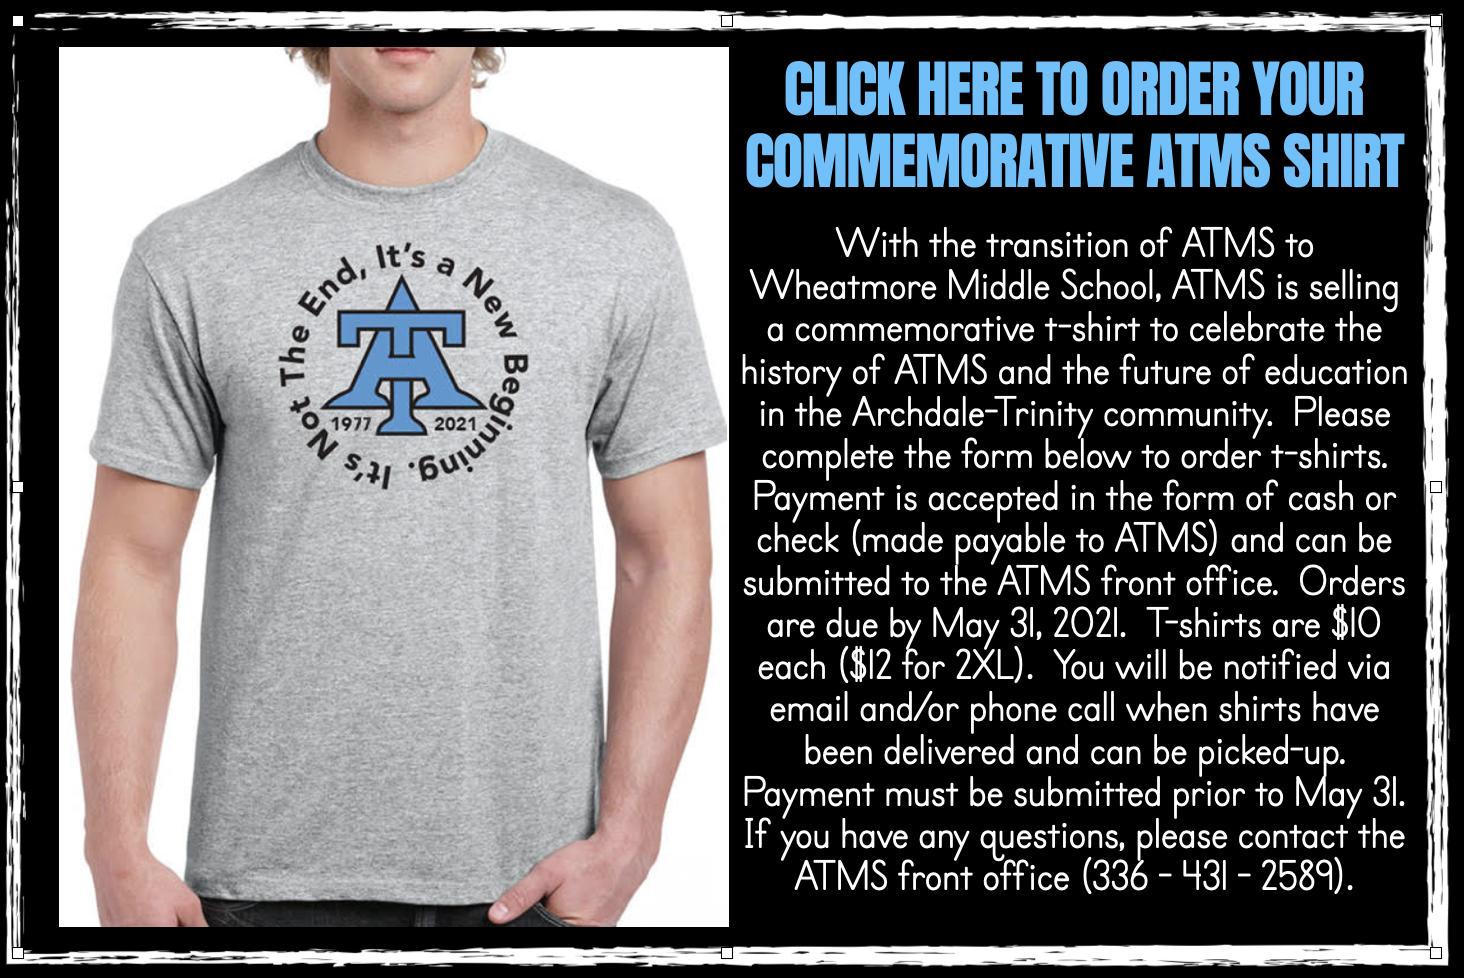 ATMS Shirt Order